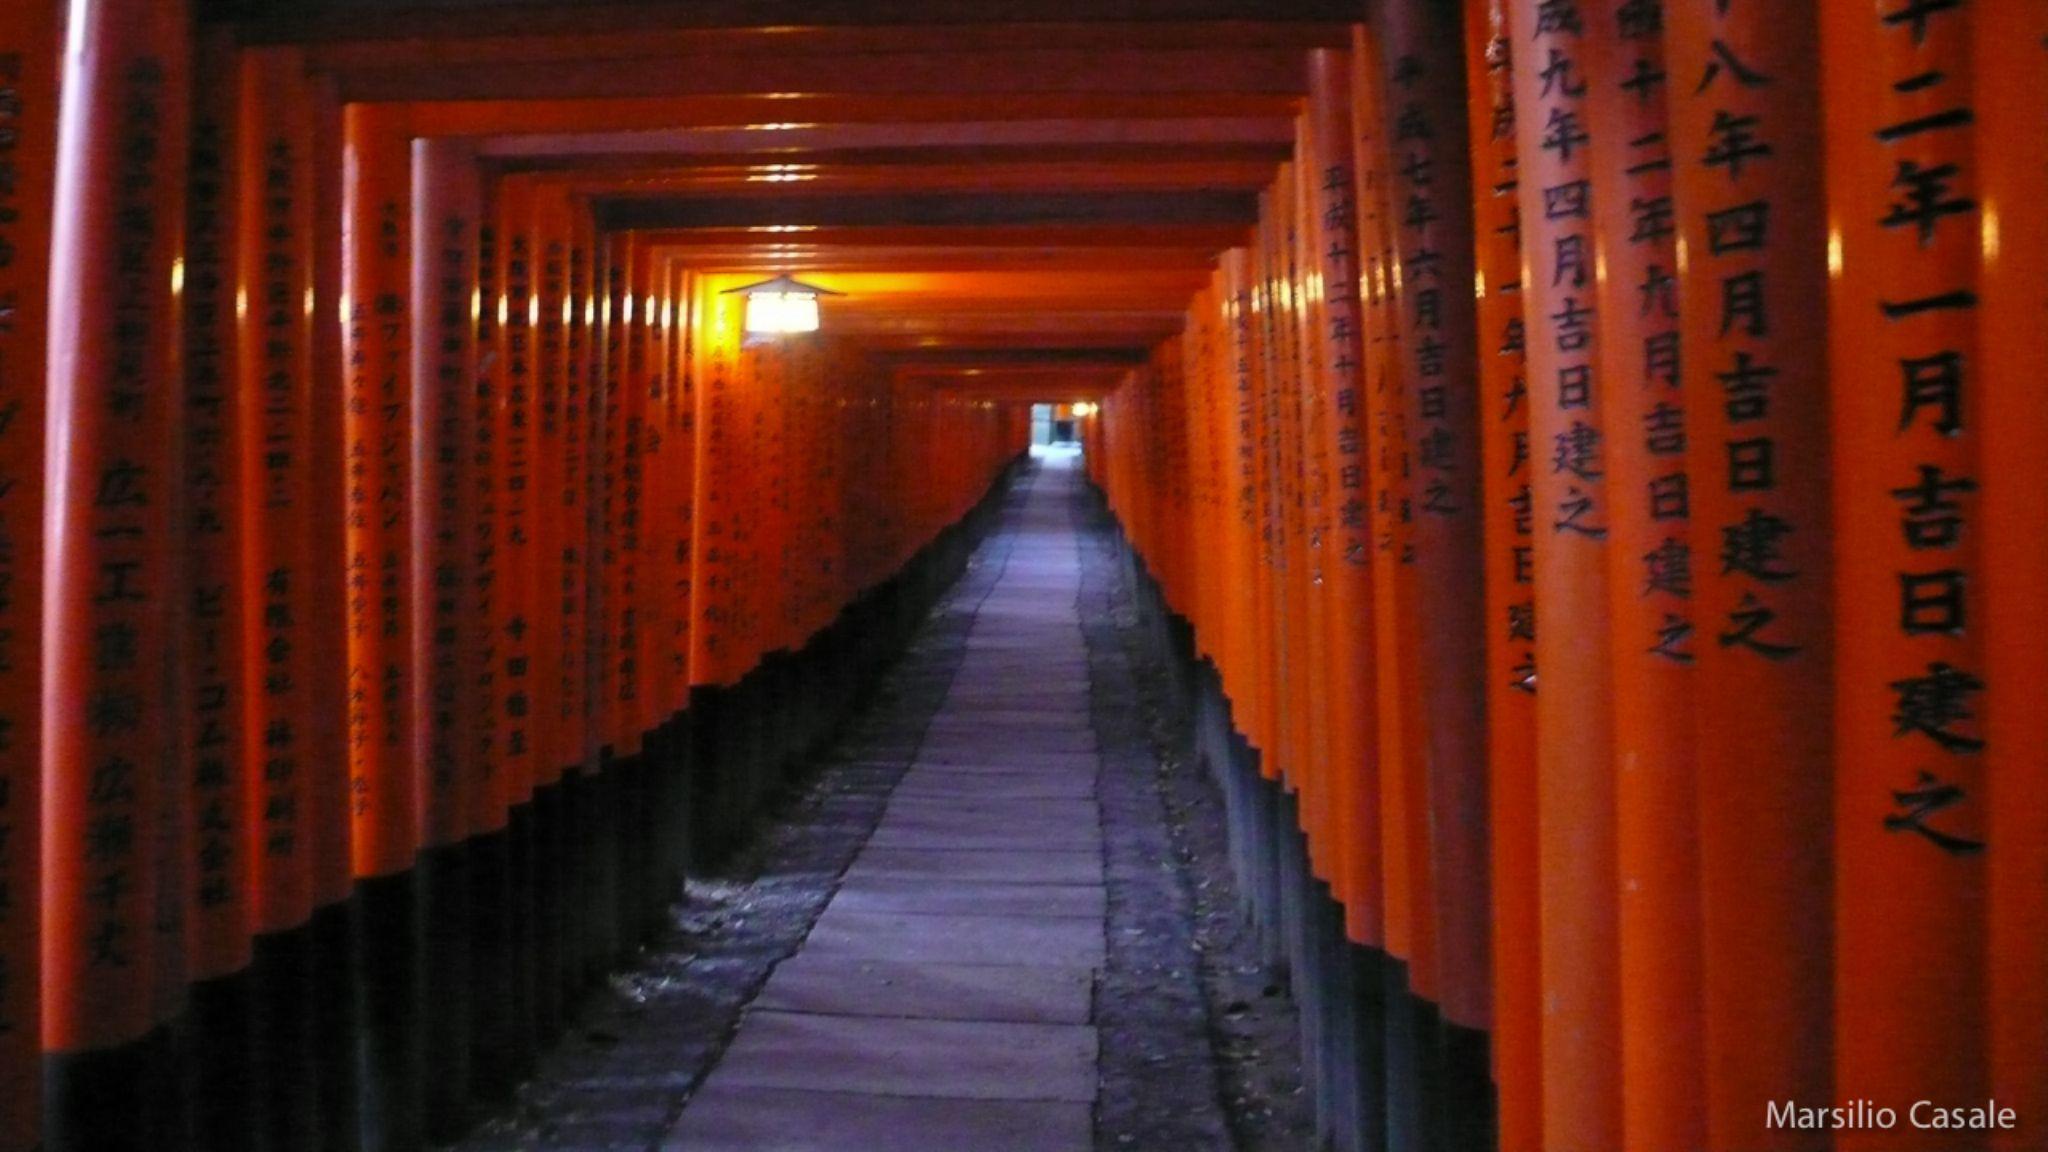 Fushimi Inari Shrine by Marsilio Casale